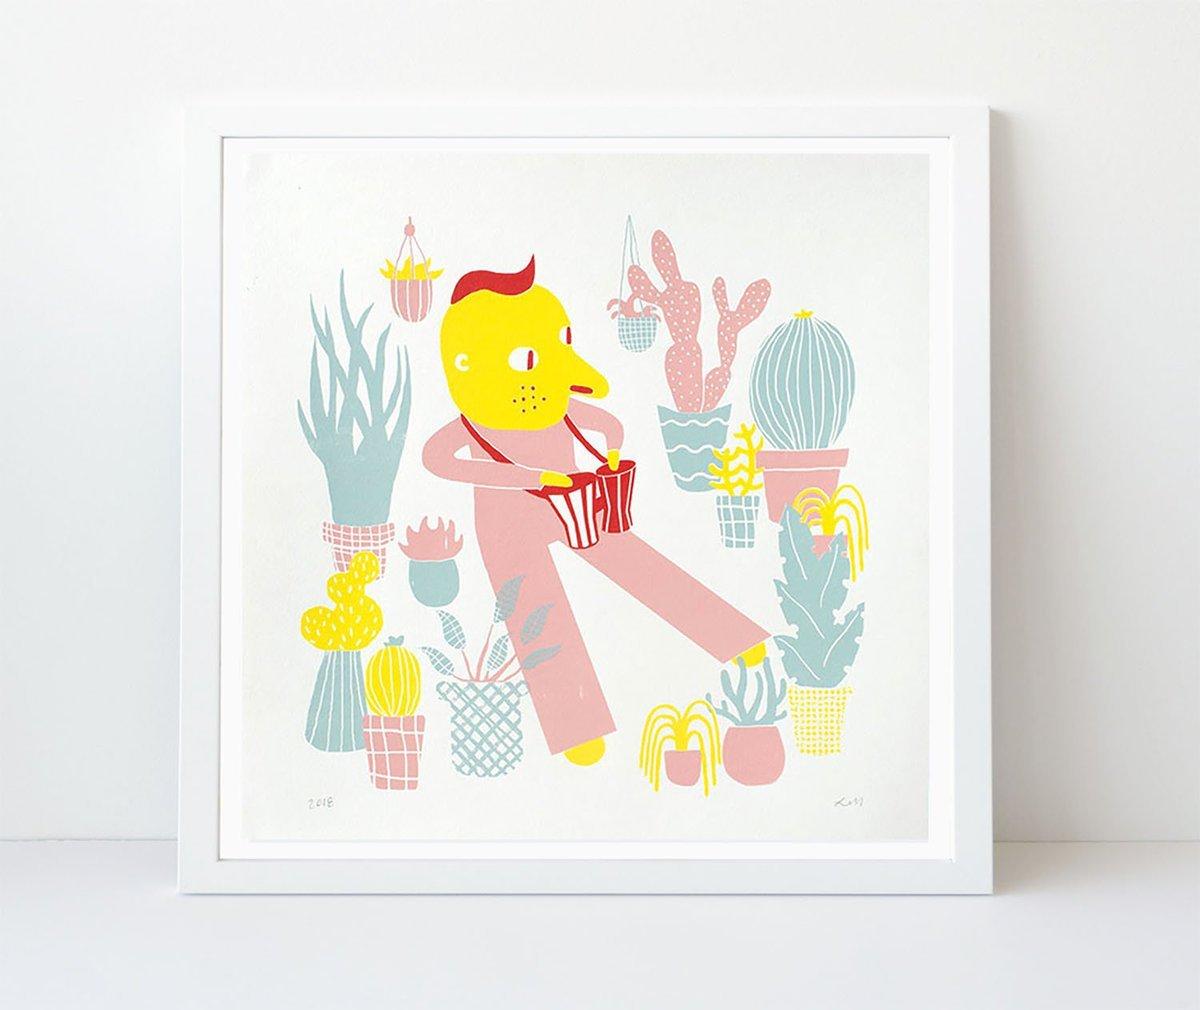 Bongo Man by Lauren Morsley